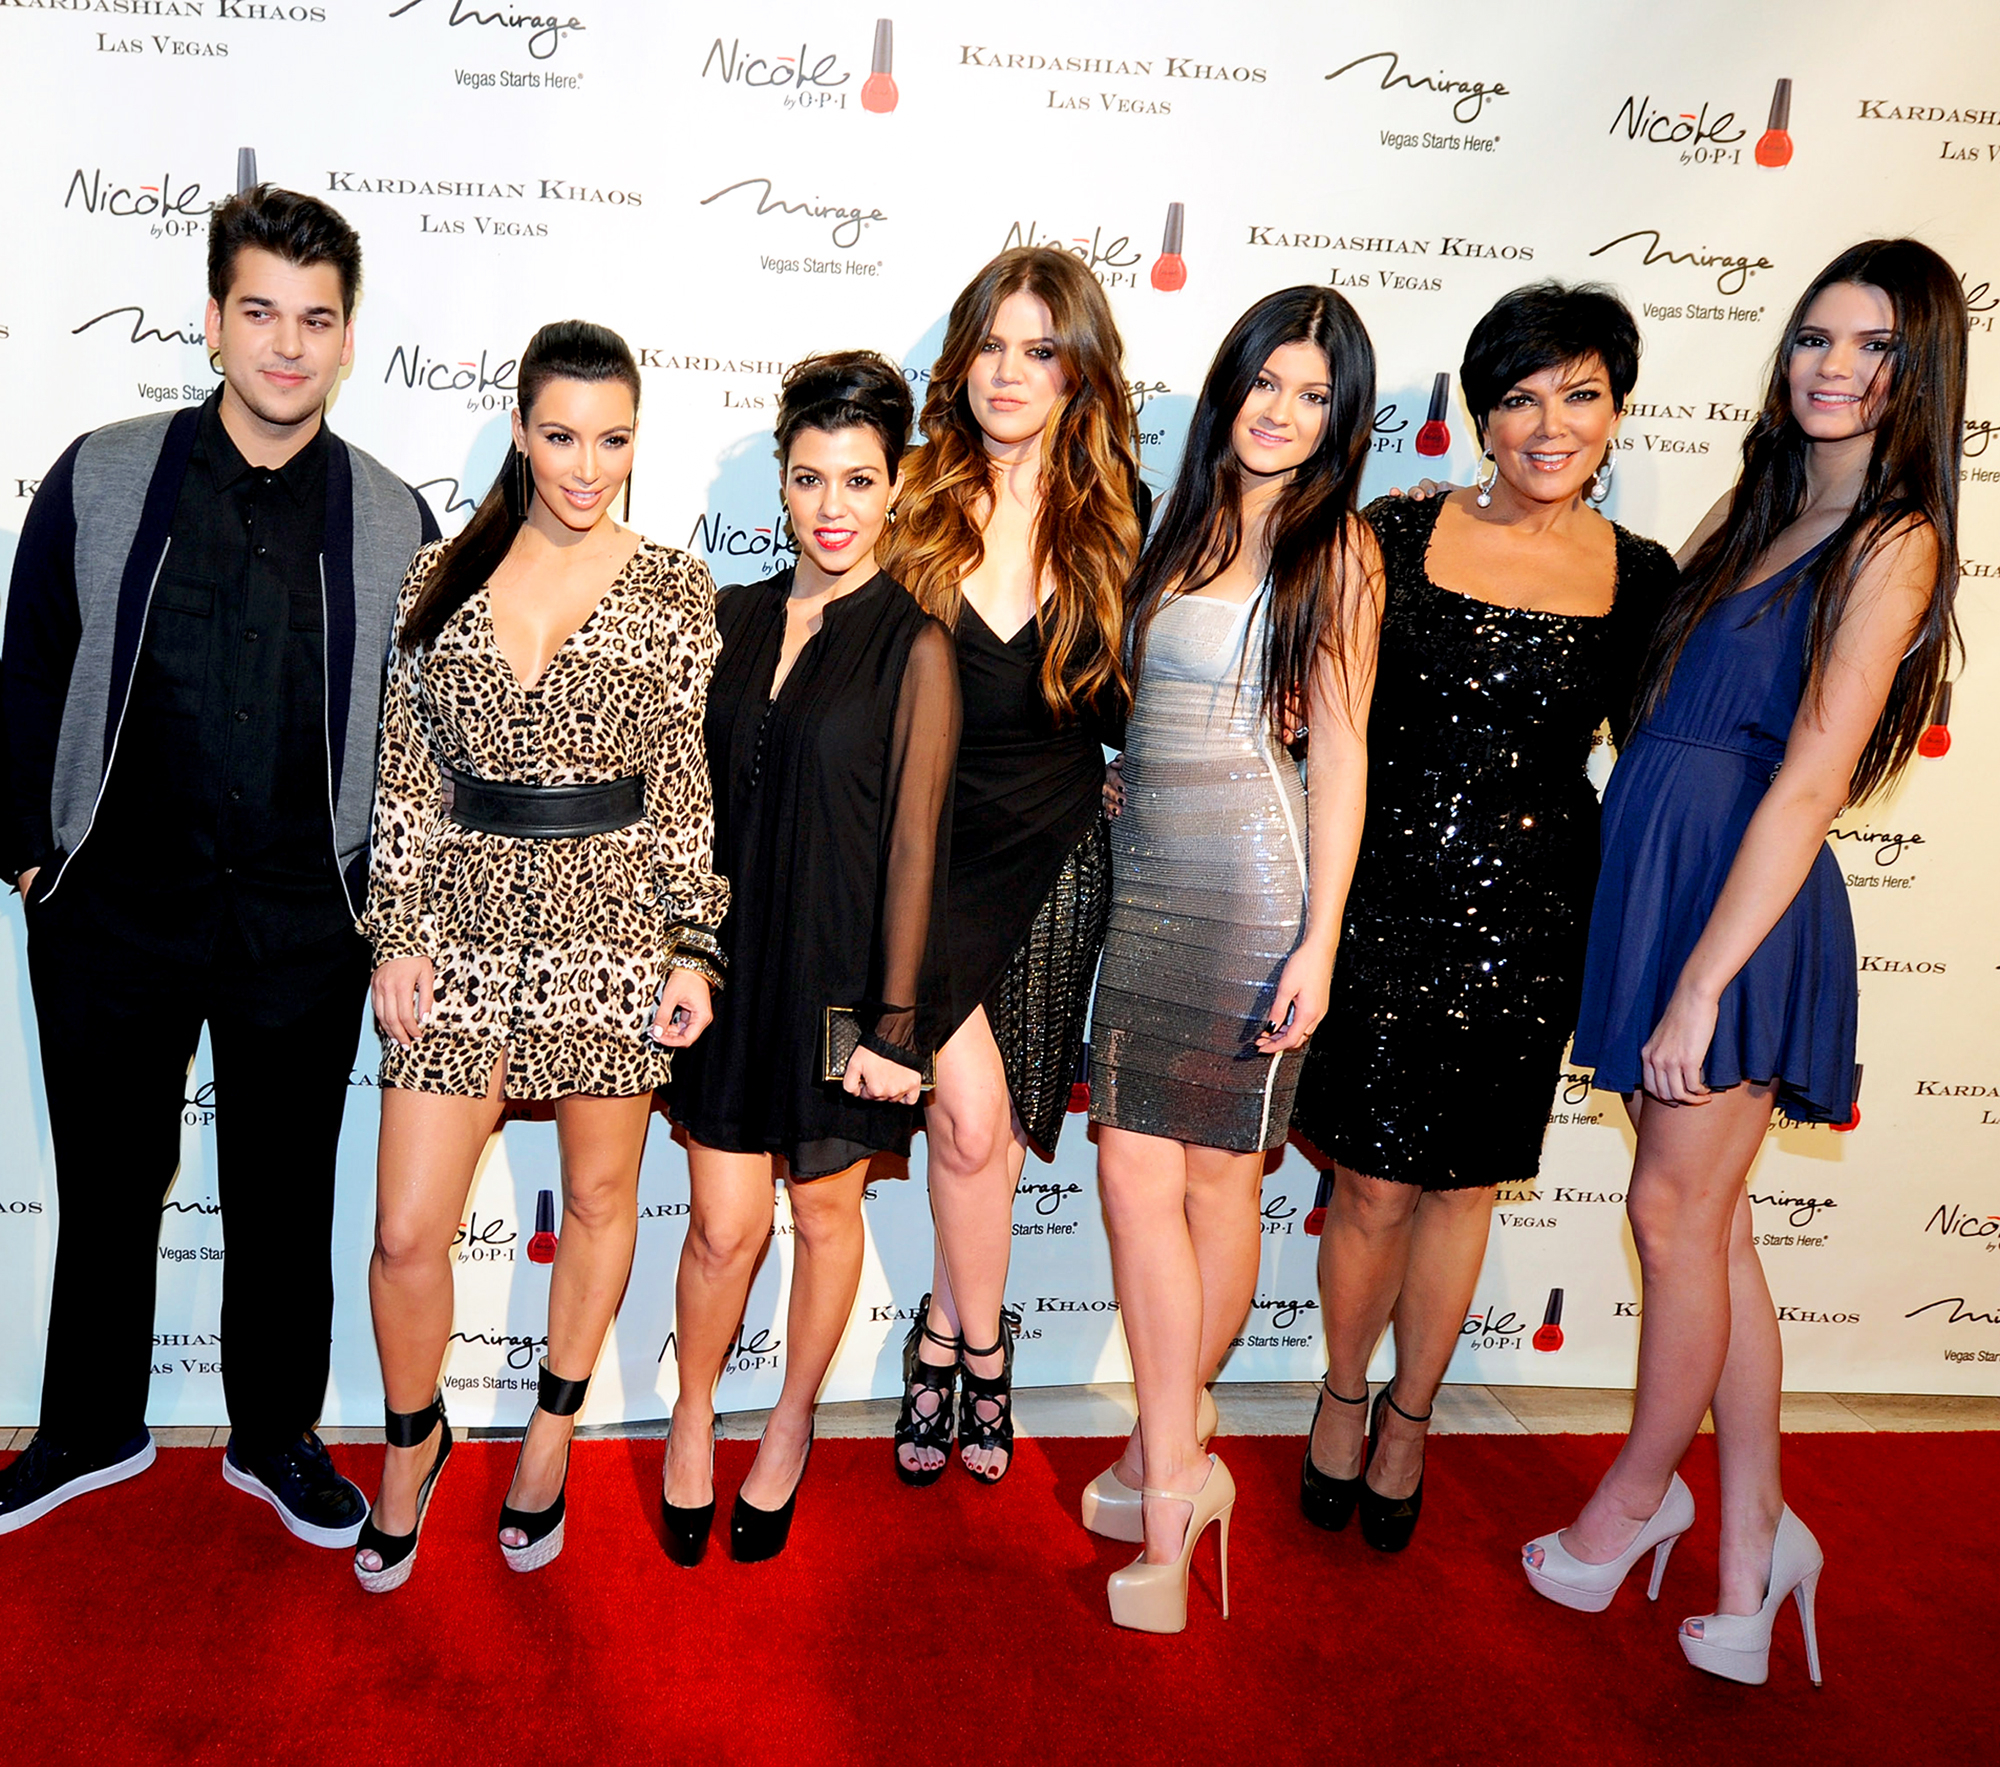 Rob Kardashian, Kim Kardashian, Kourtney Kardashian, Khloe Kardashian, Kylie Jenner, Kris Jenner and Kendall Jenner